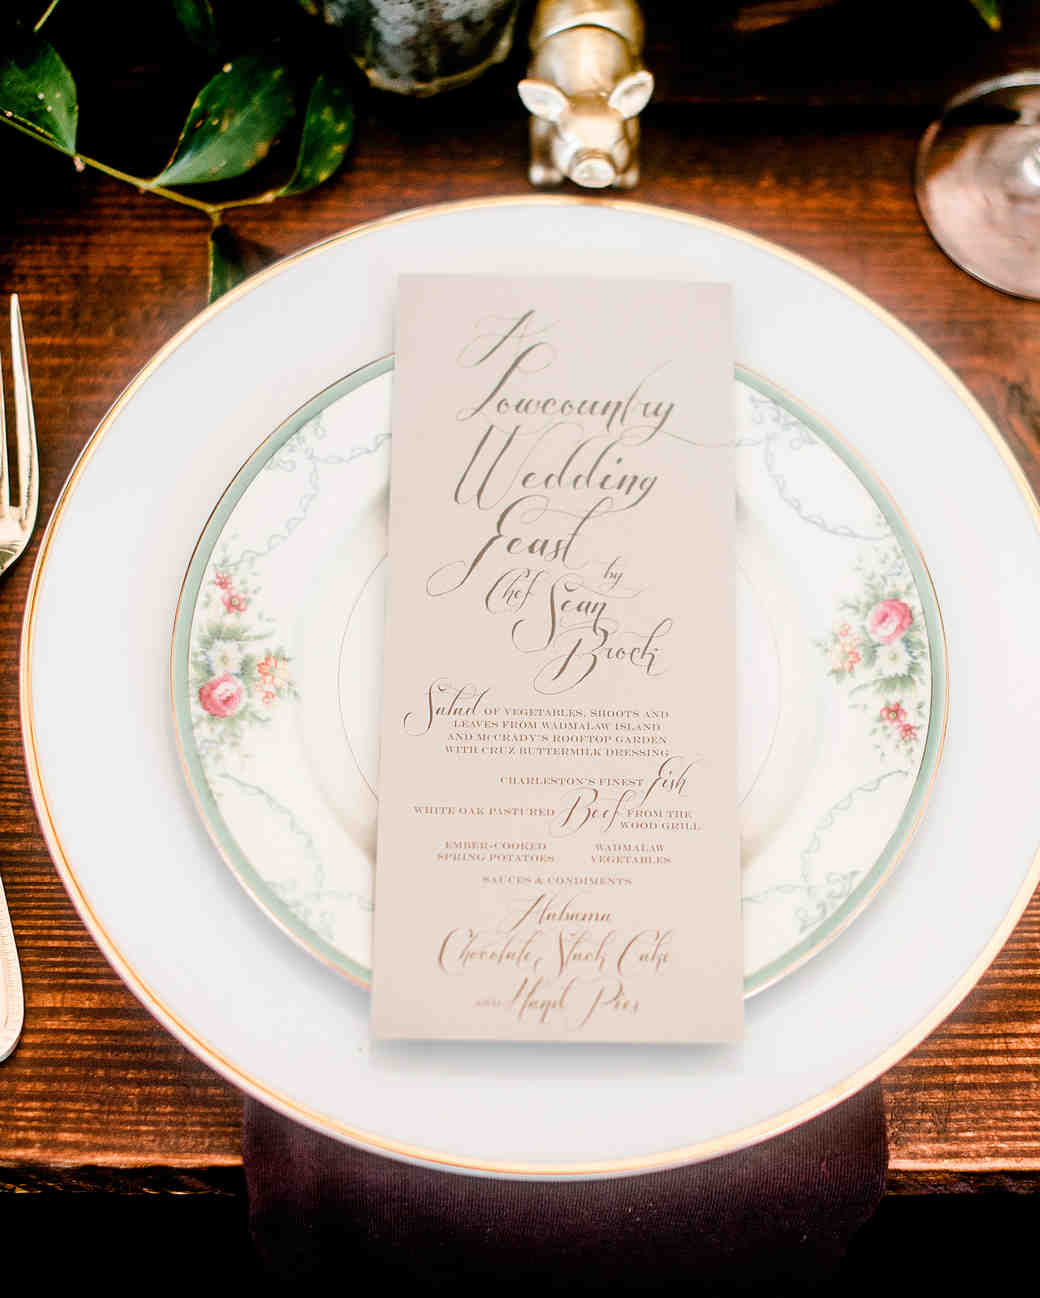 melany-drew-wedding-placesetting-011-s112184-0915.jpg